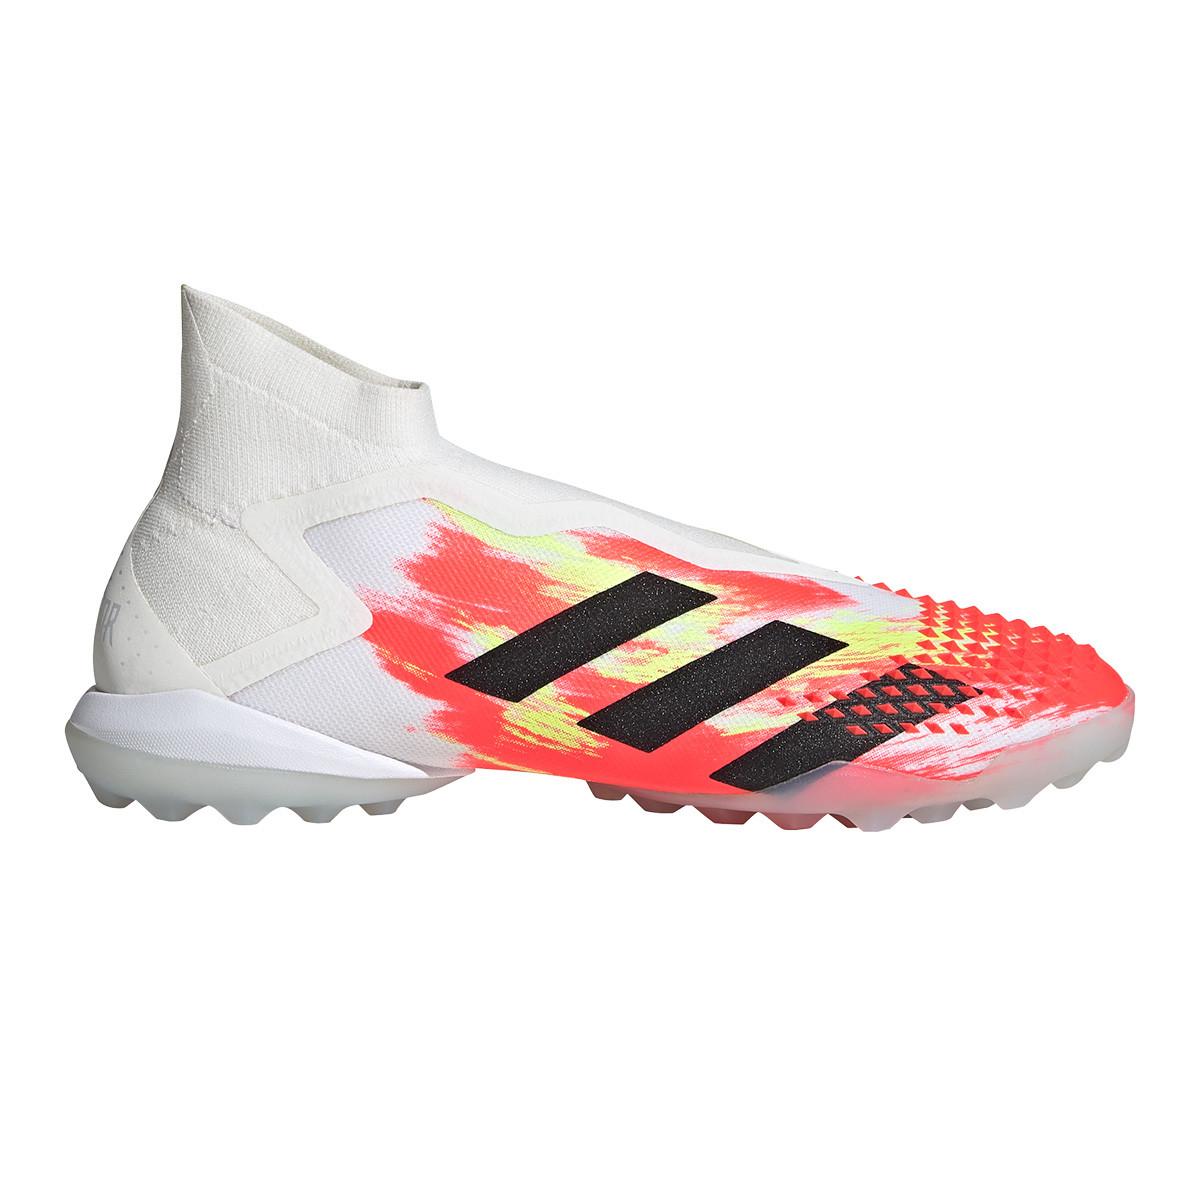 Melodrama Elevado pegar  Football Boots adidas Predator 20+ Turf White-Black-Pop - Football store  Fútbol Emotion